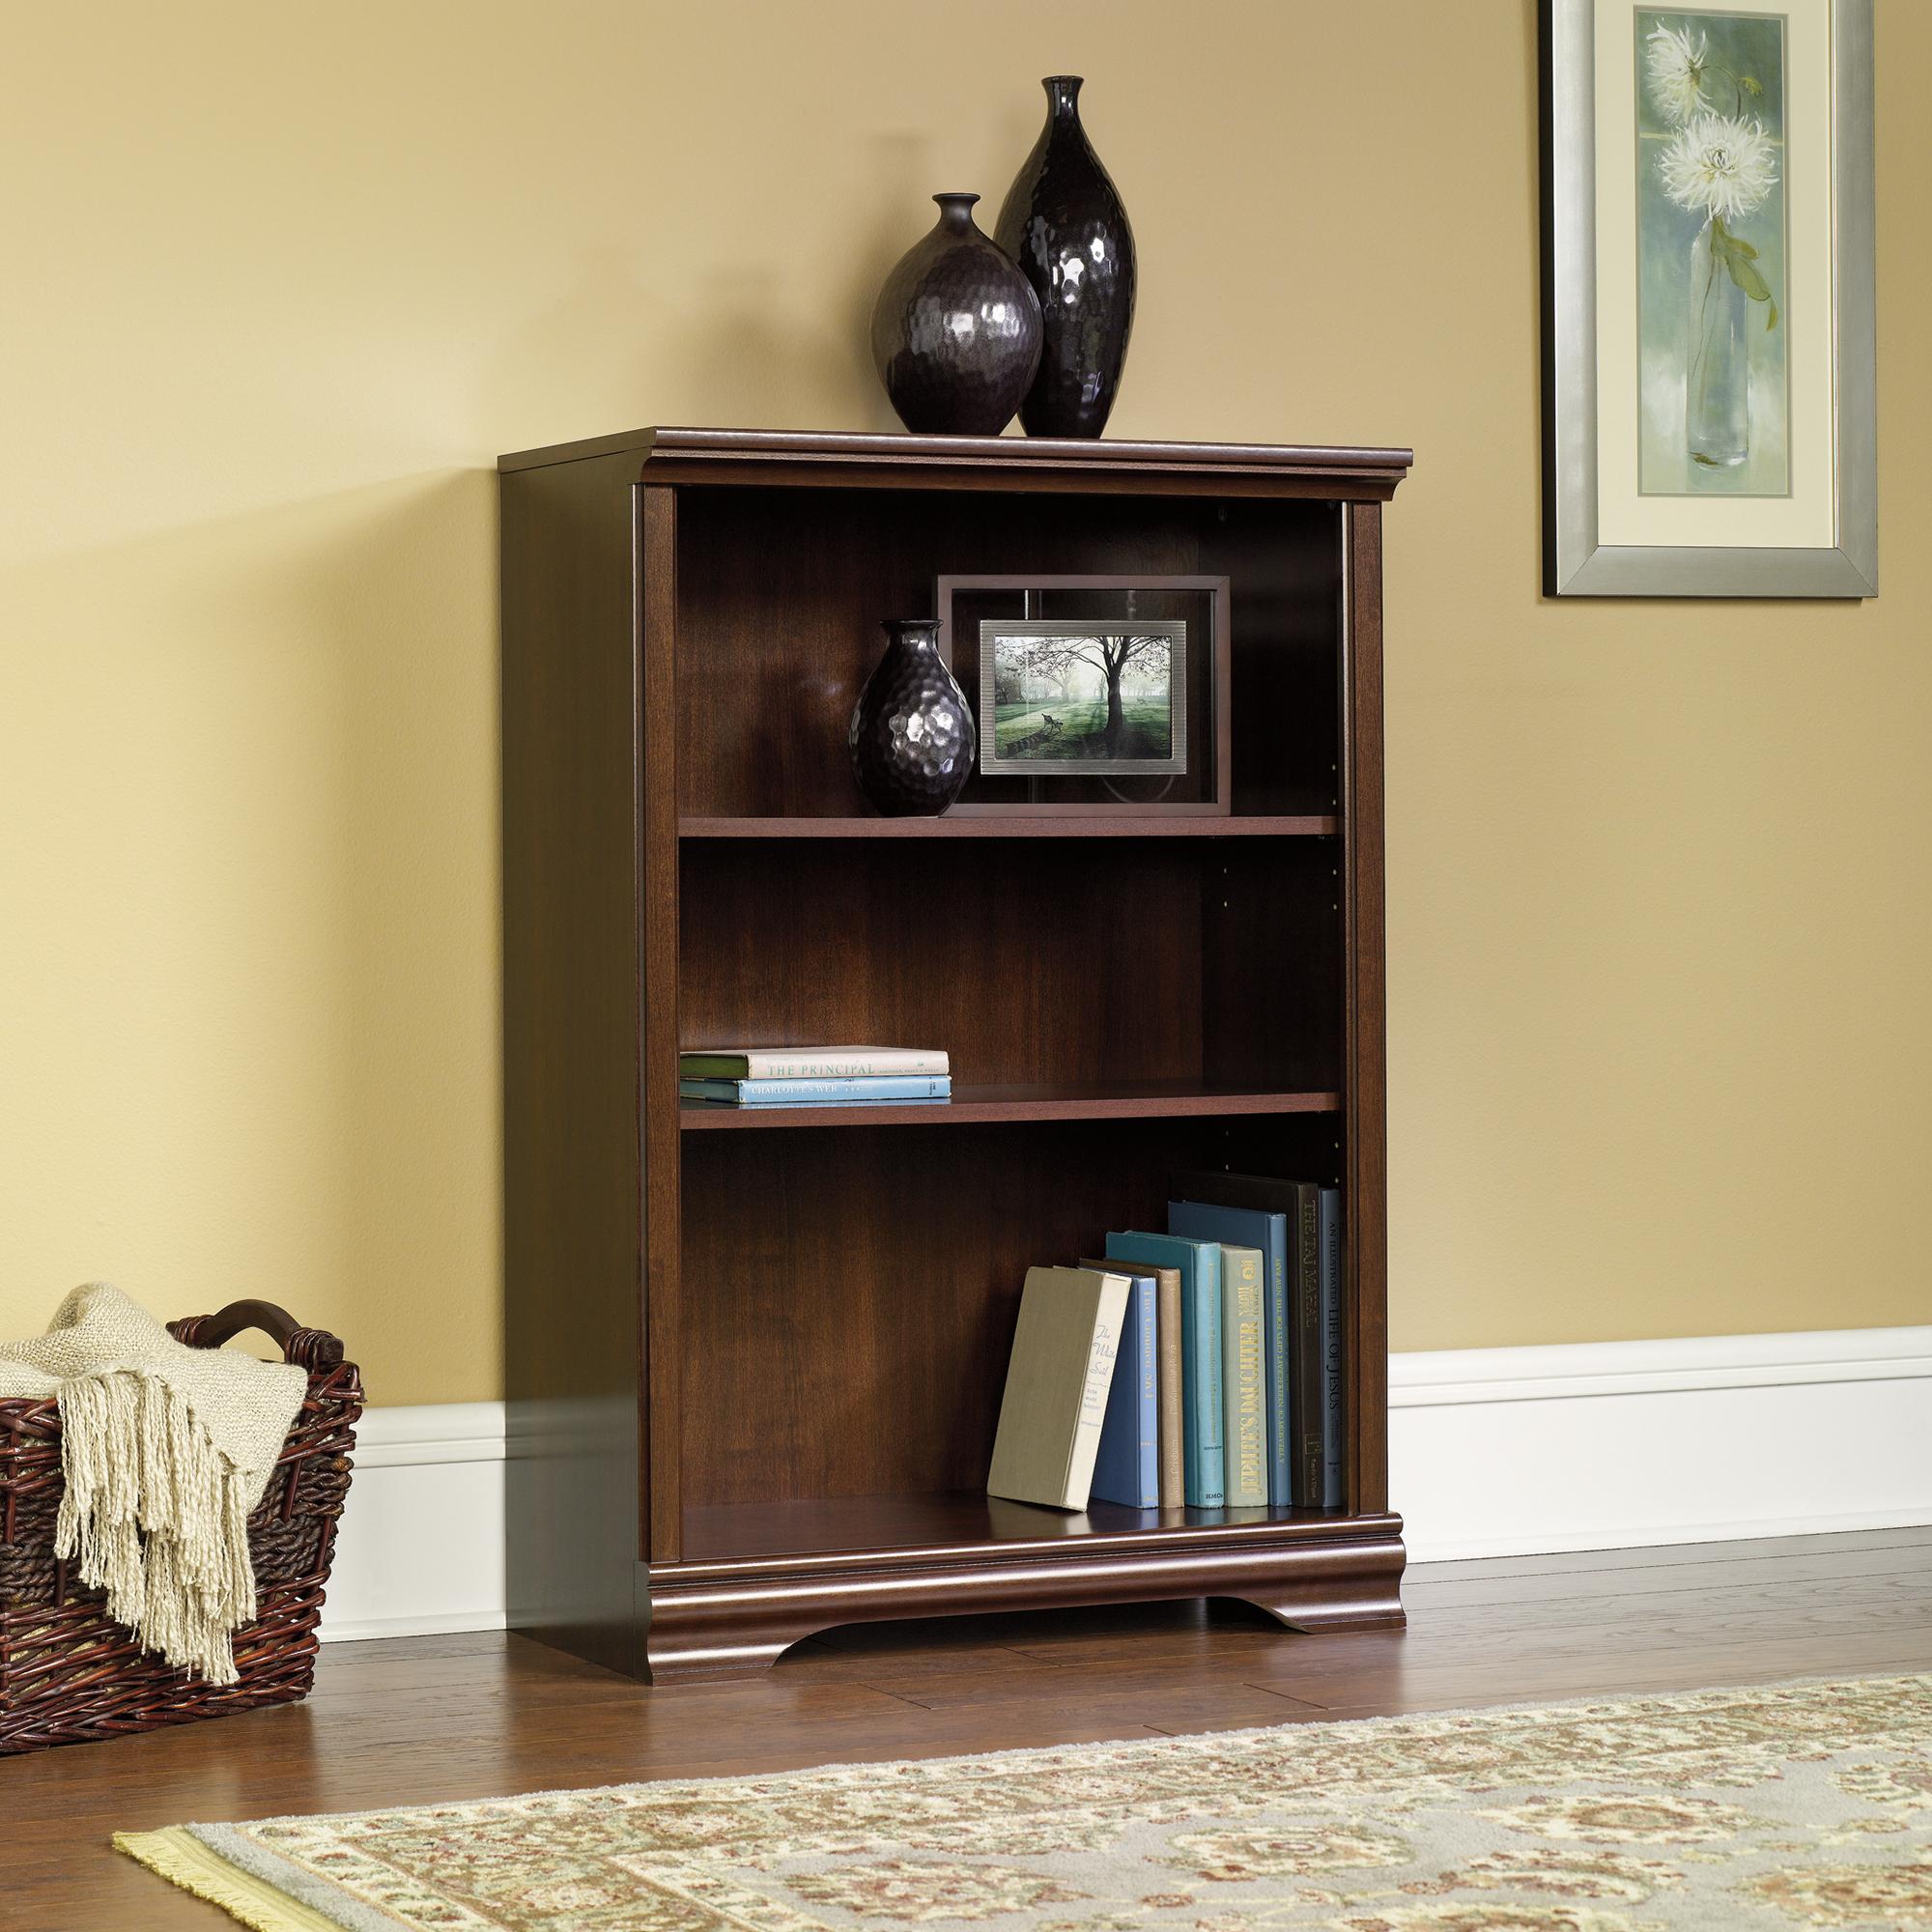 Sauder 3-Shelf Cherry Bookcase (411898) - The Furniture Co.